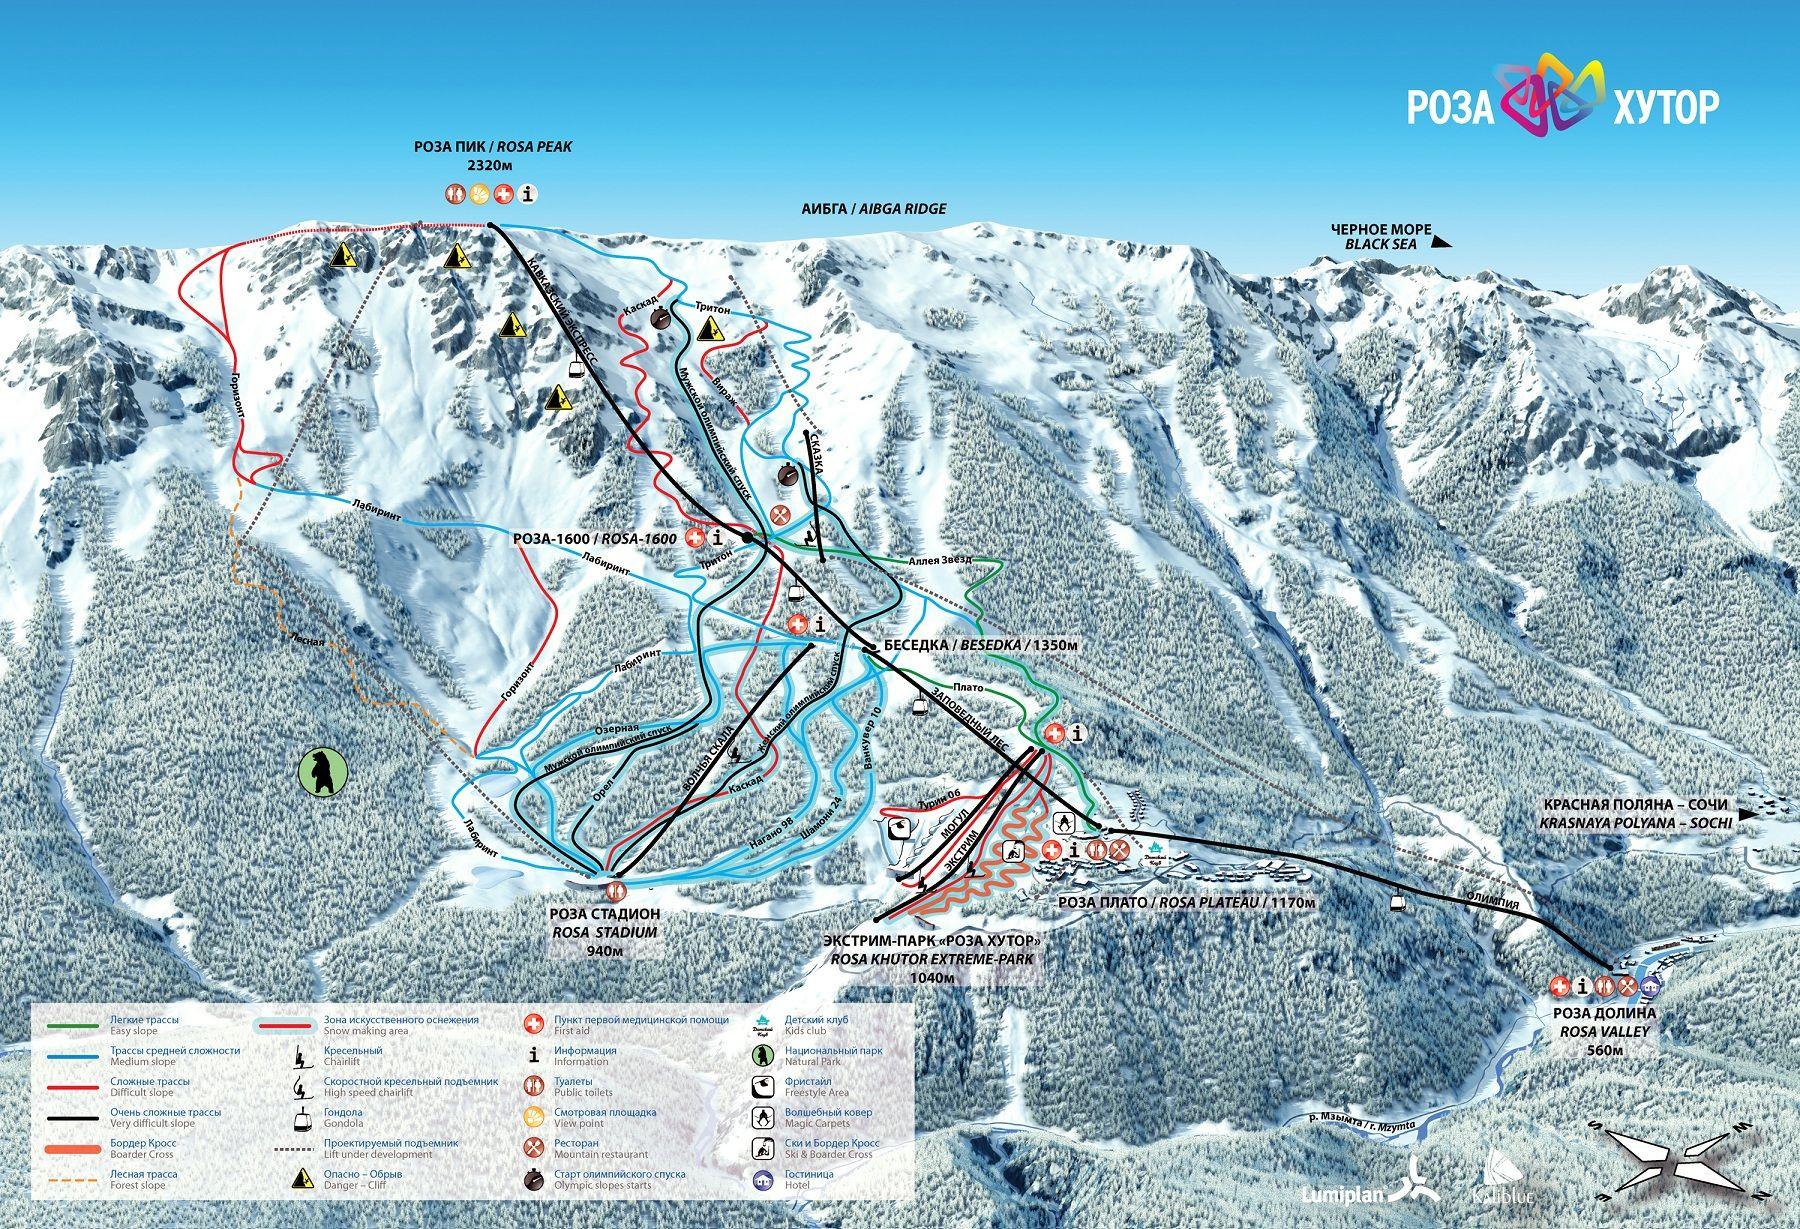 Southern California Ski Resorts Map Printable Rosa Khutor Alpine - Southern California Ski Resorts Map